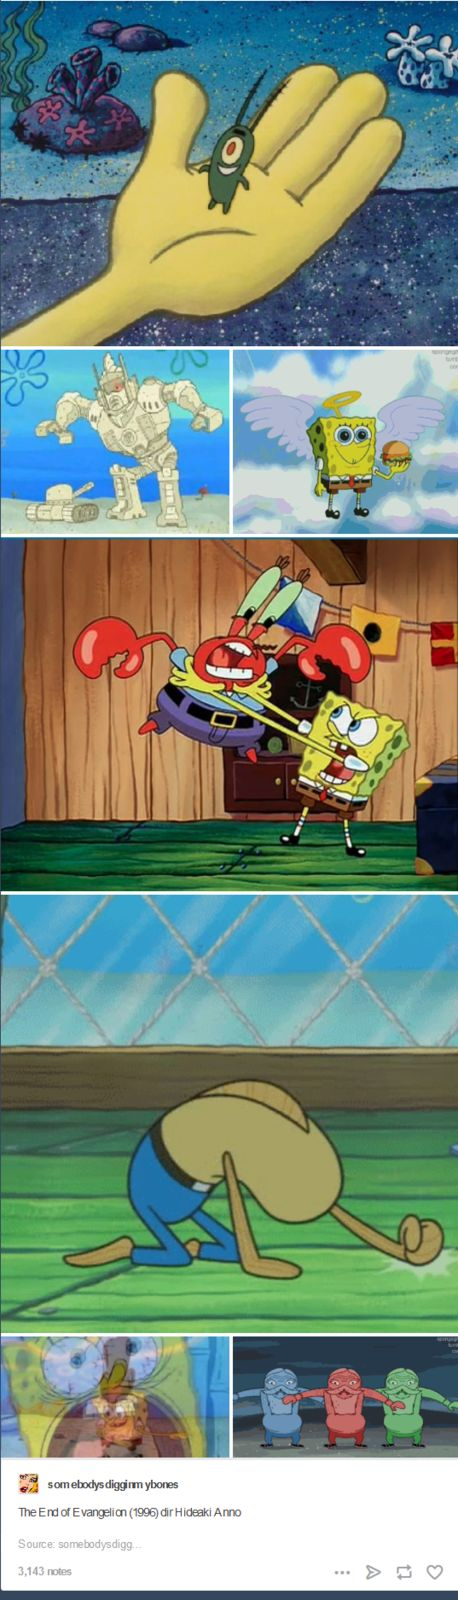 End of evangelion spongebob